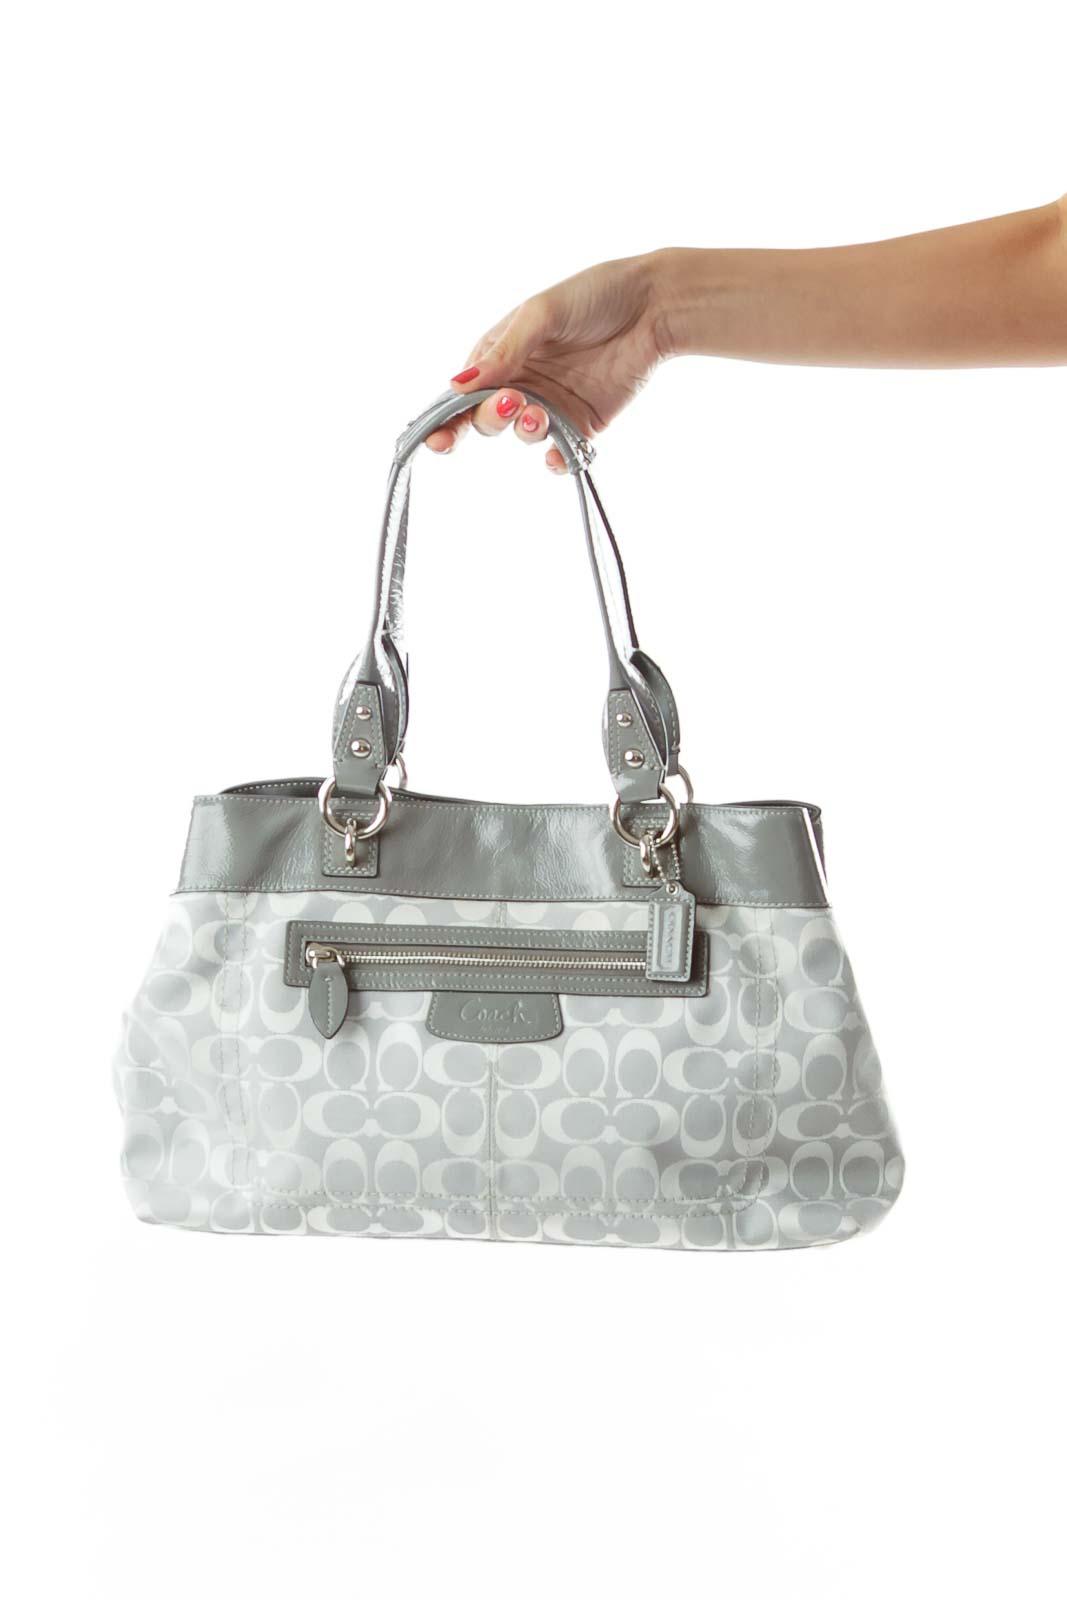 203a46c0 Shop Gray Coach Print Satchel clothing and handbags at SilkRoll ...